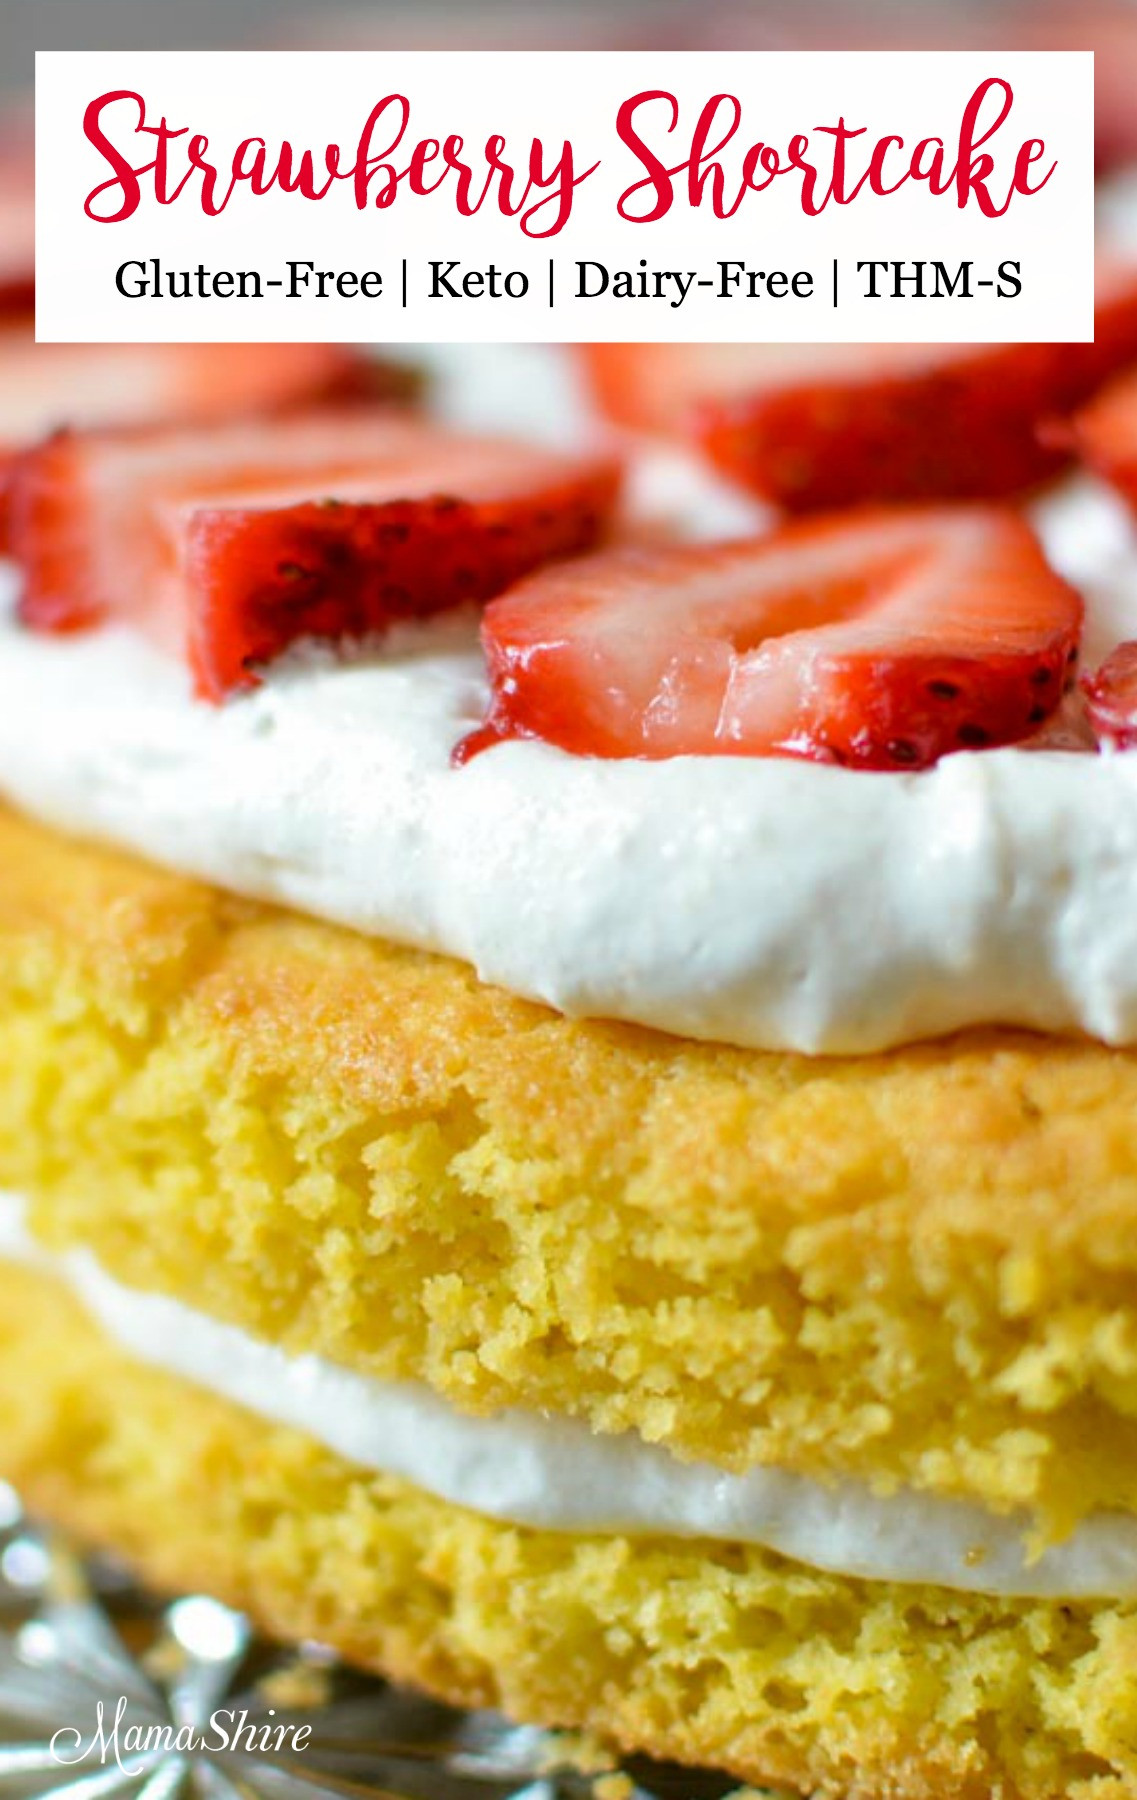 Keto Dairy Free Desserts  Gluten Free Strawberry Shortcake Dairy free MamaShire